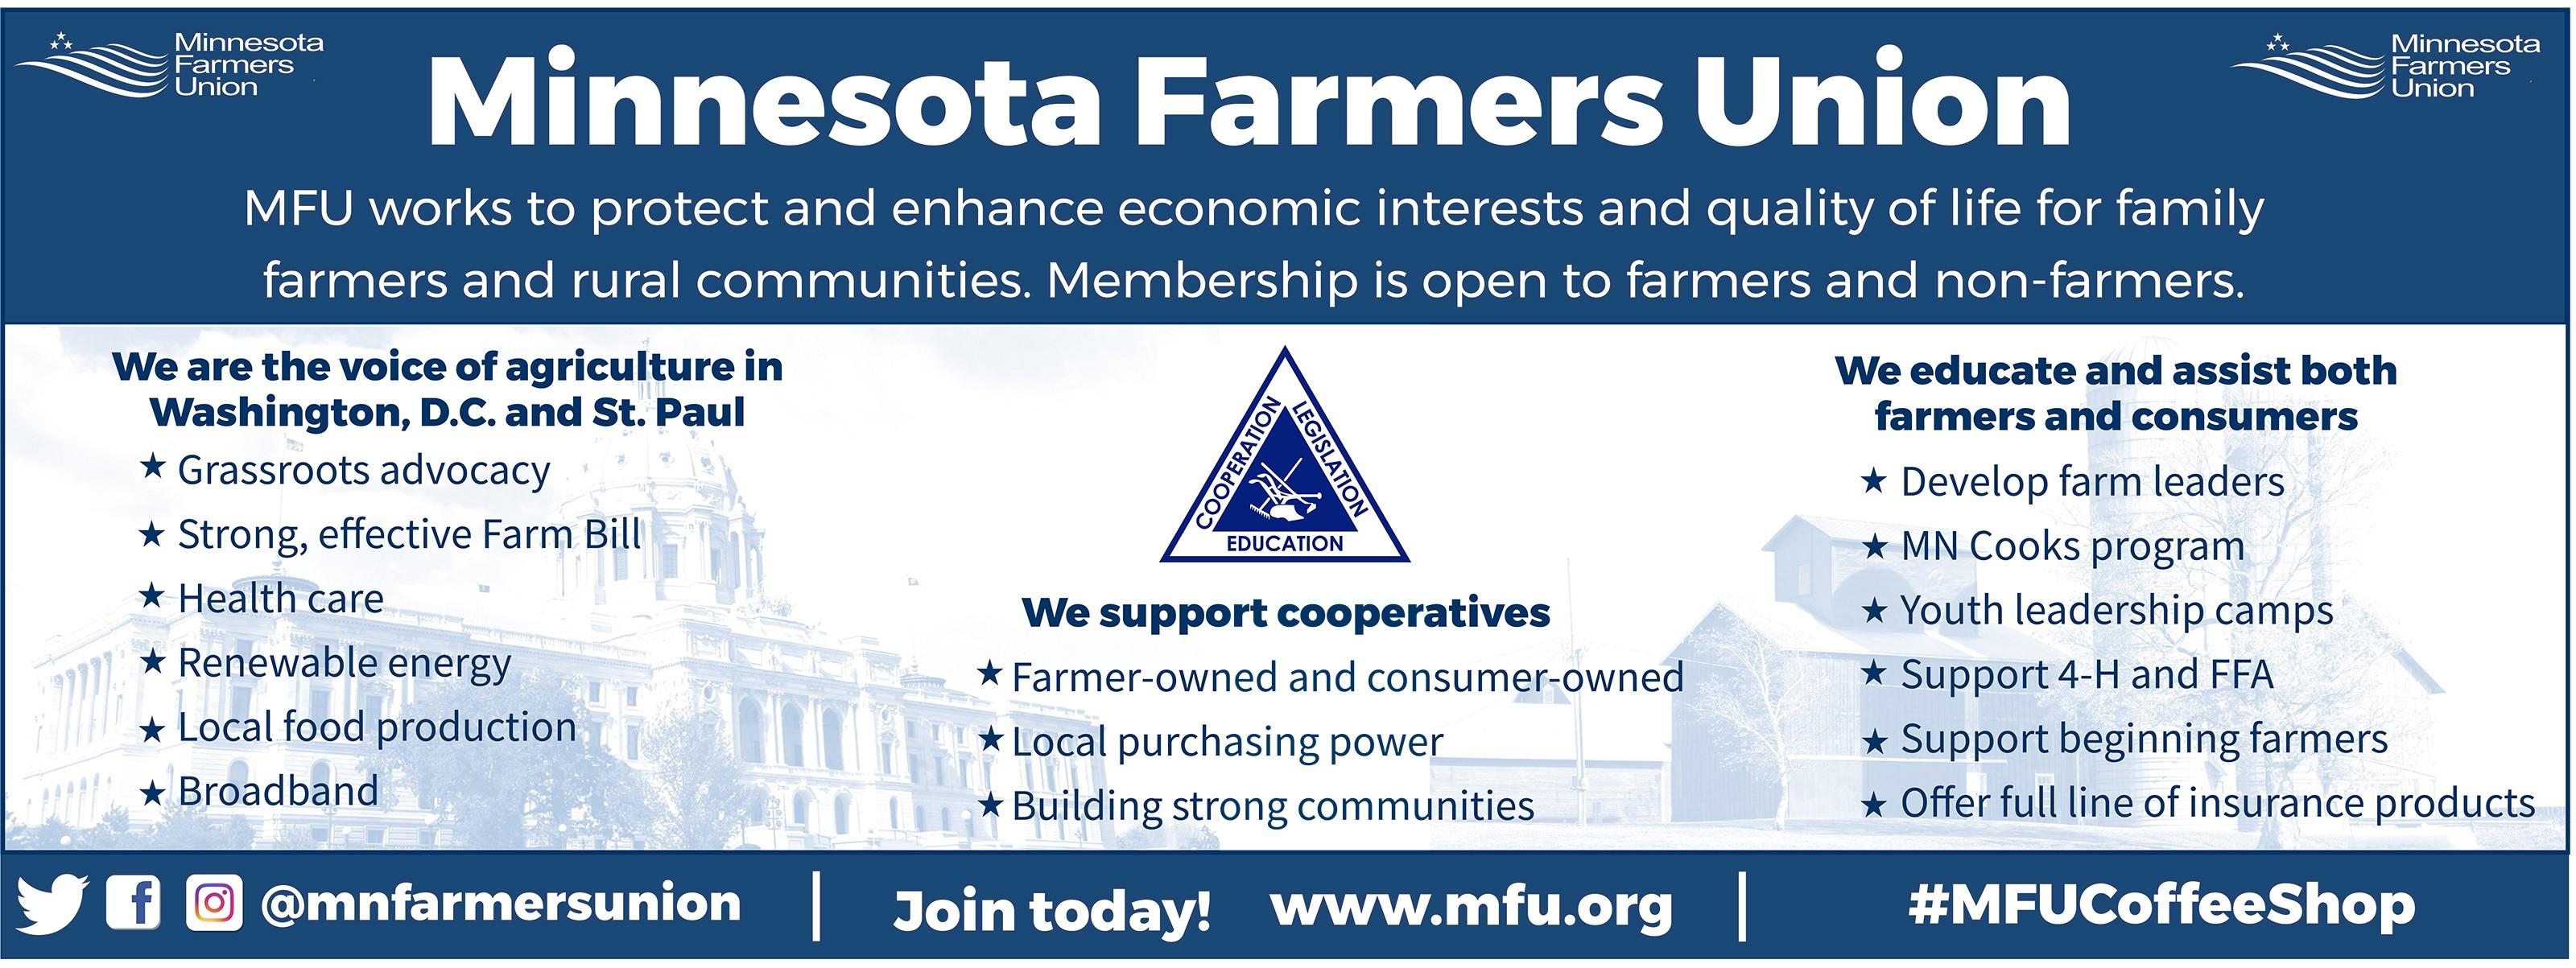 Minnesota Farmers Union | LinkedIn